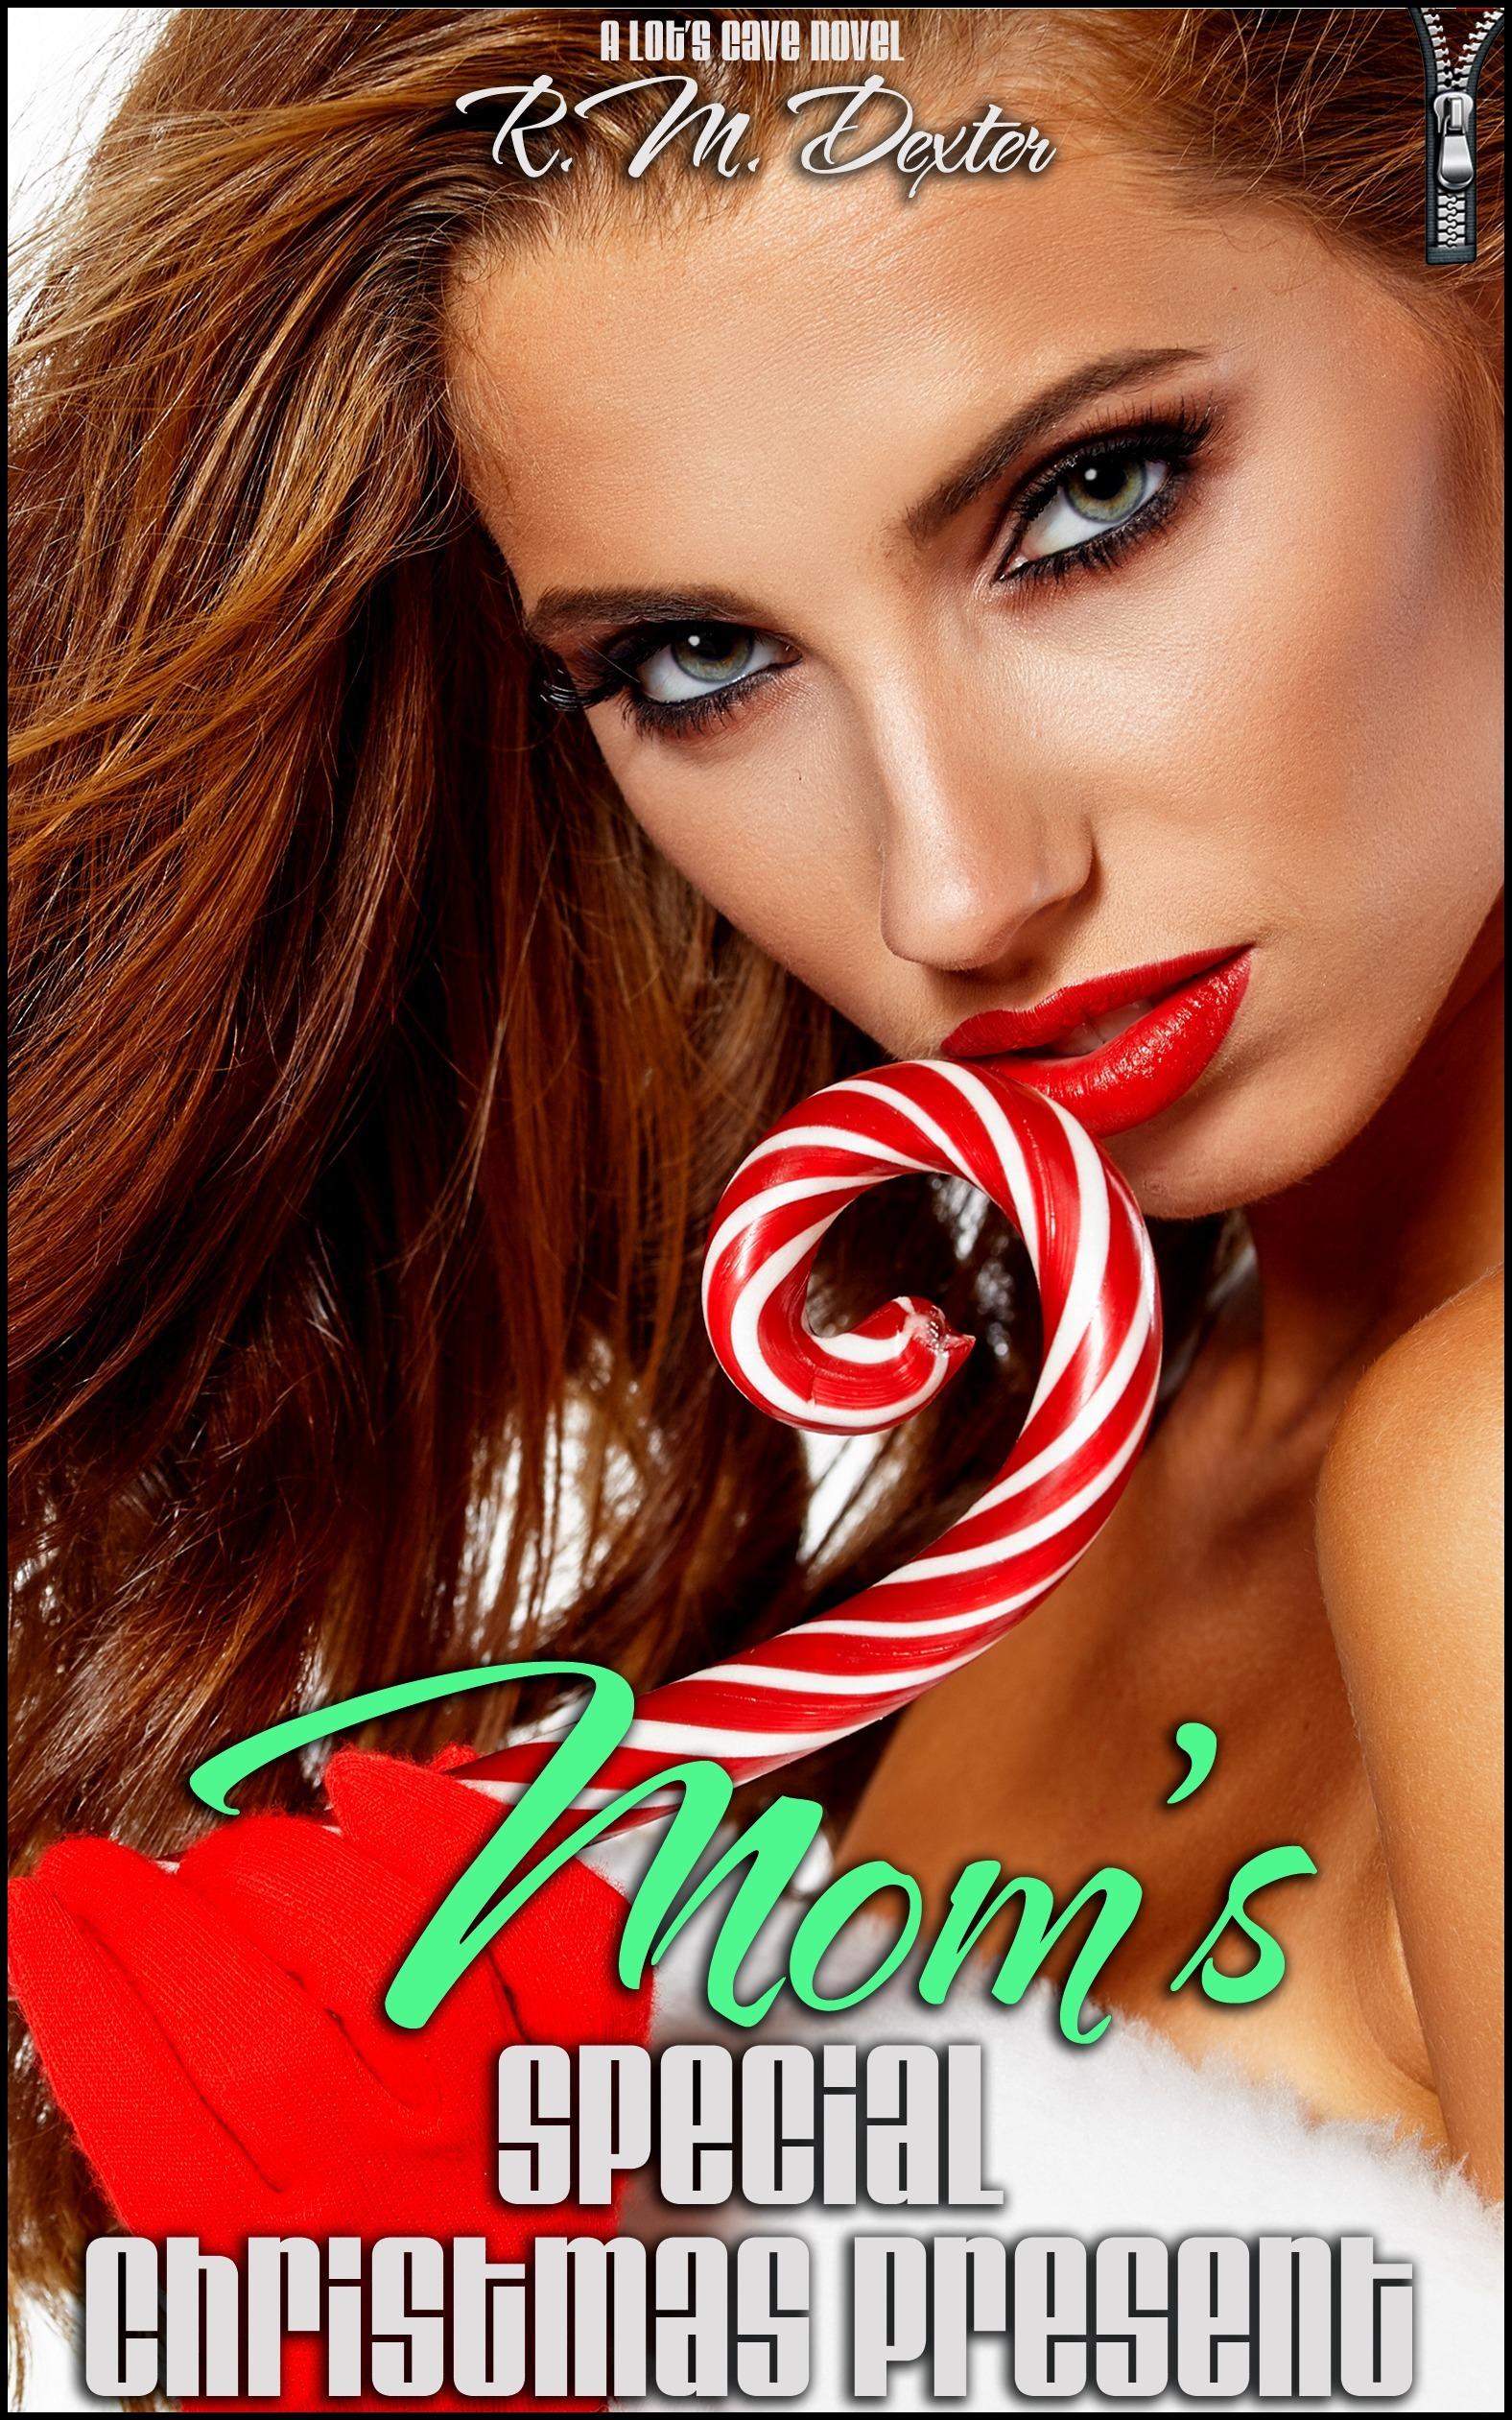 Moms Special Christmas Present R.M. Dexter